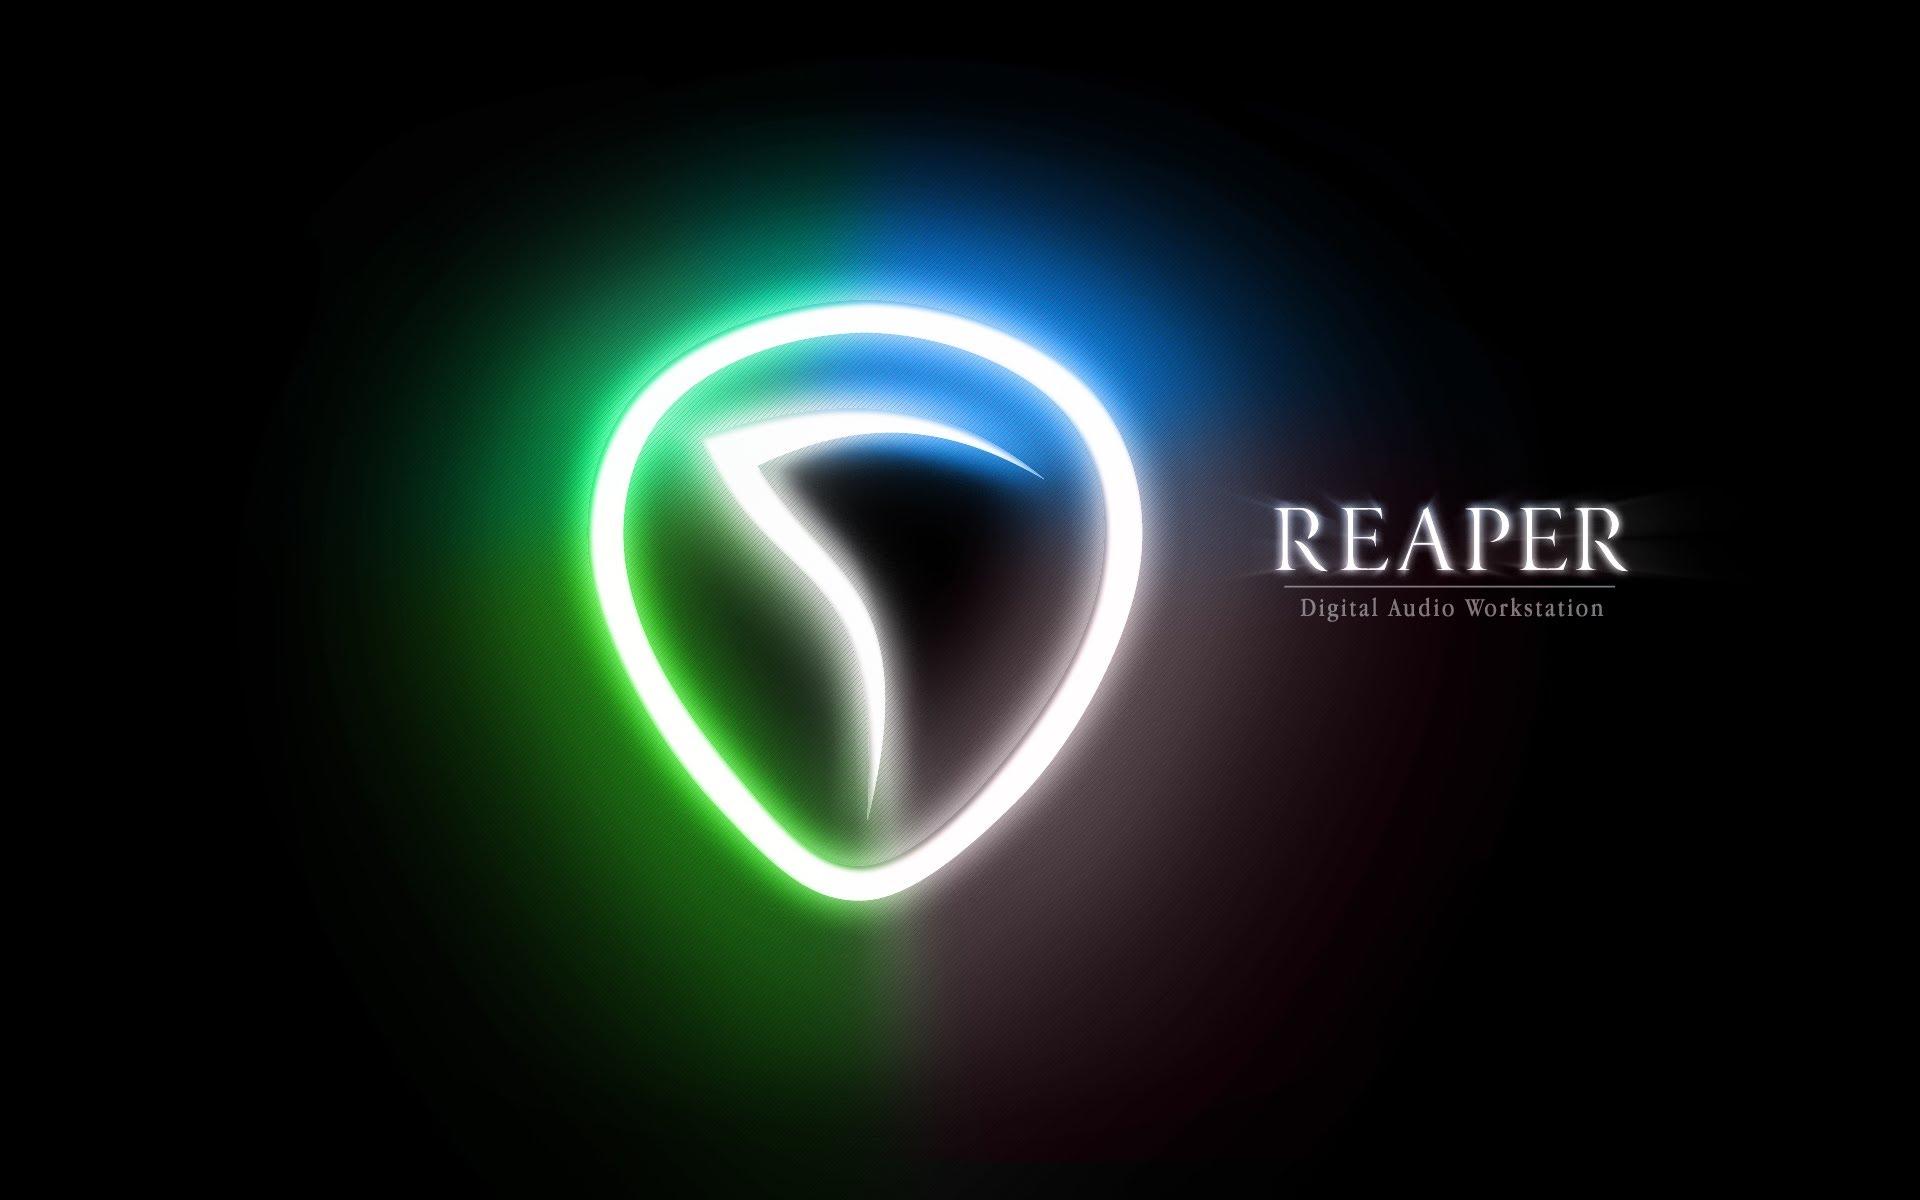 Reaper (logo)